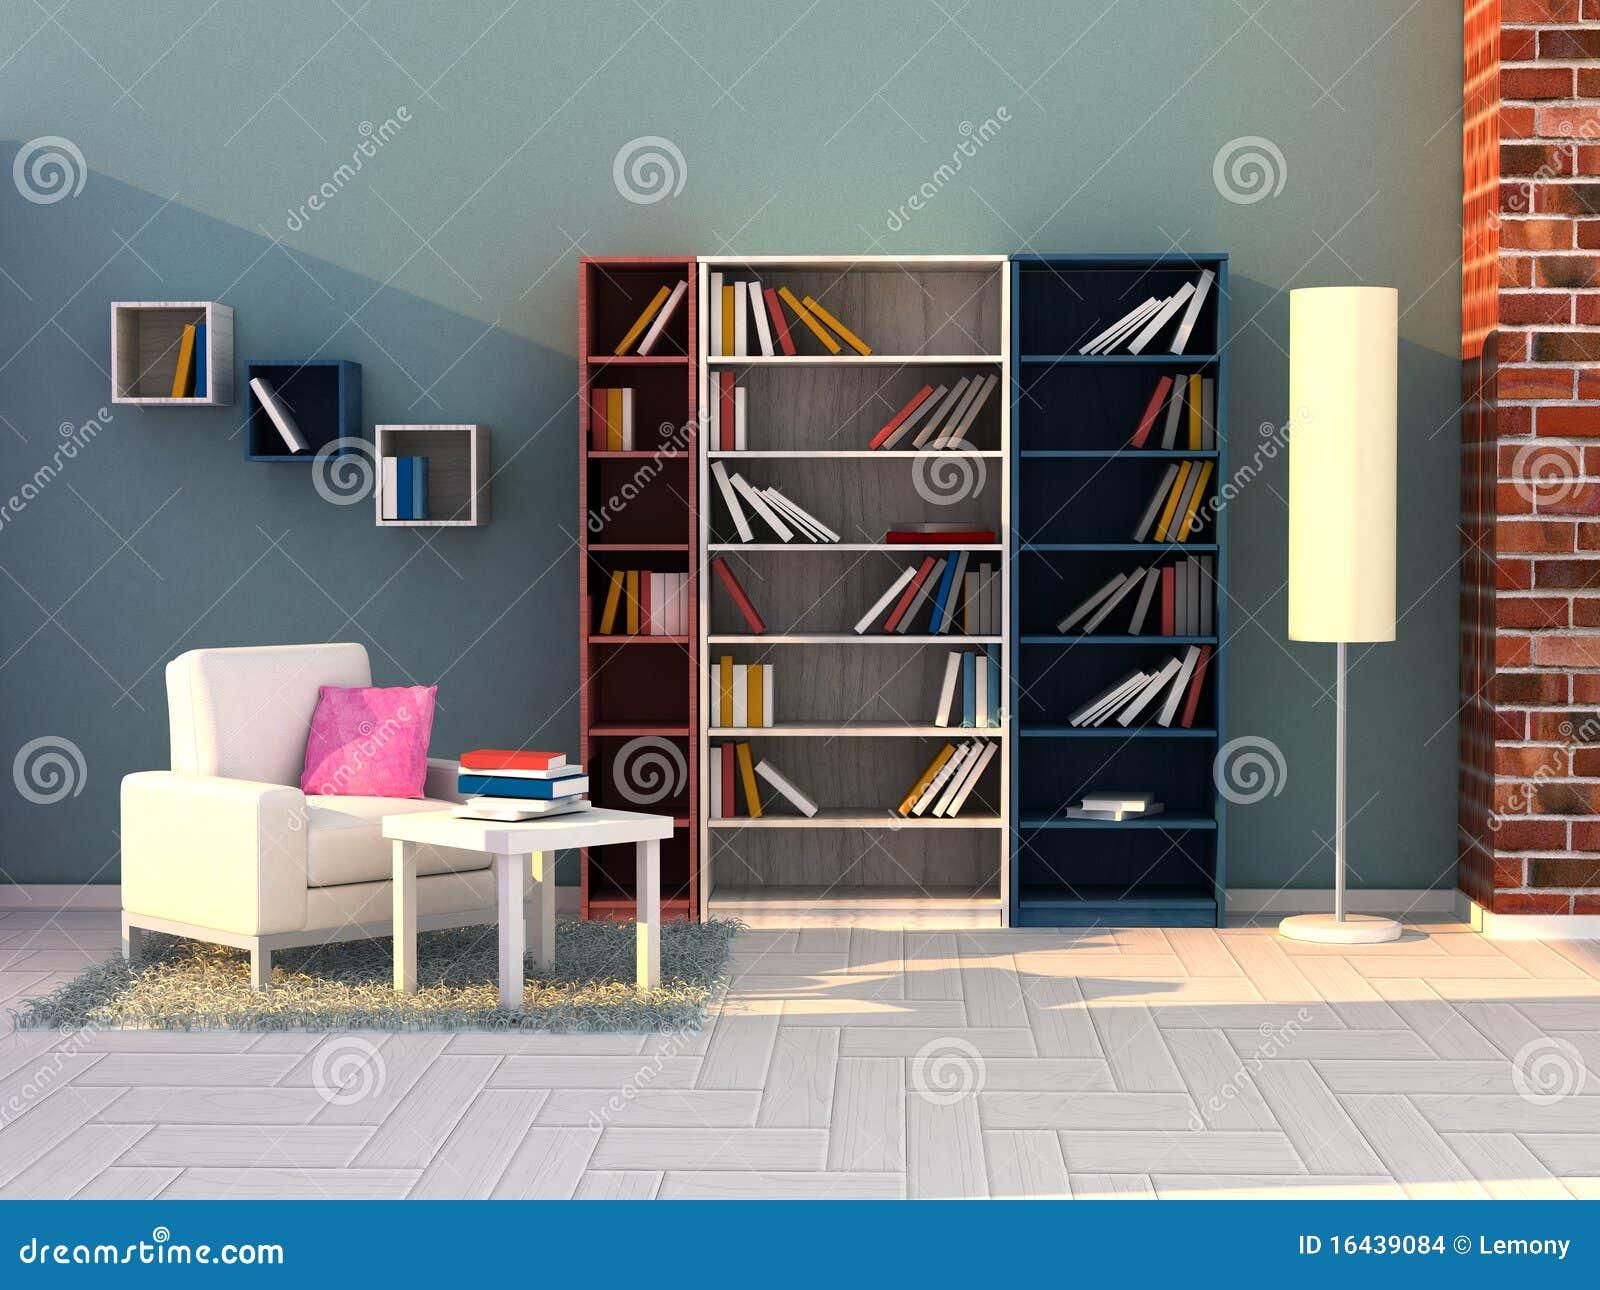 youth study room interior - photo #22